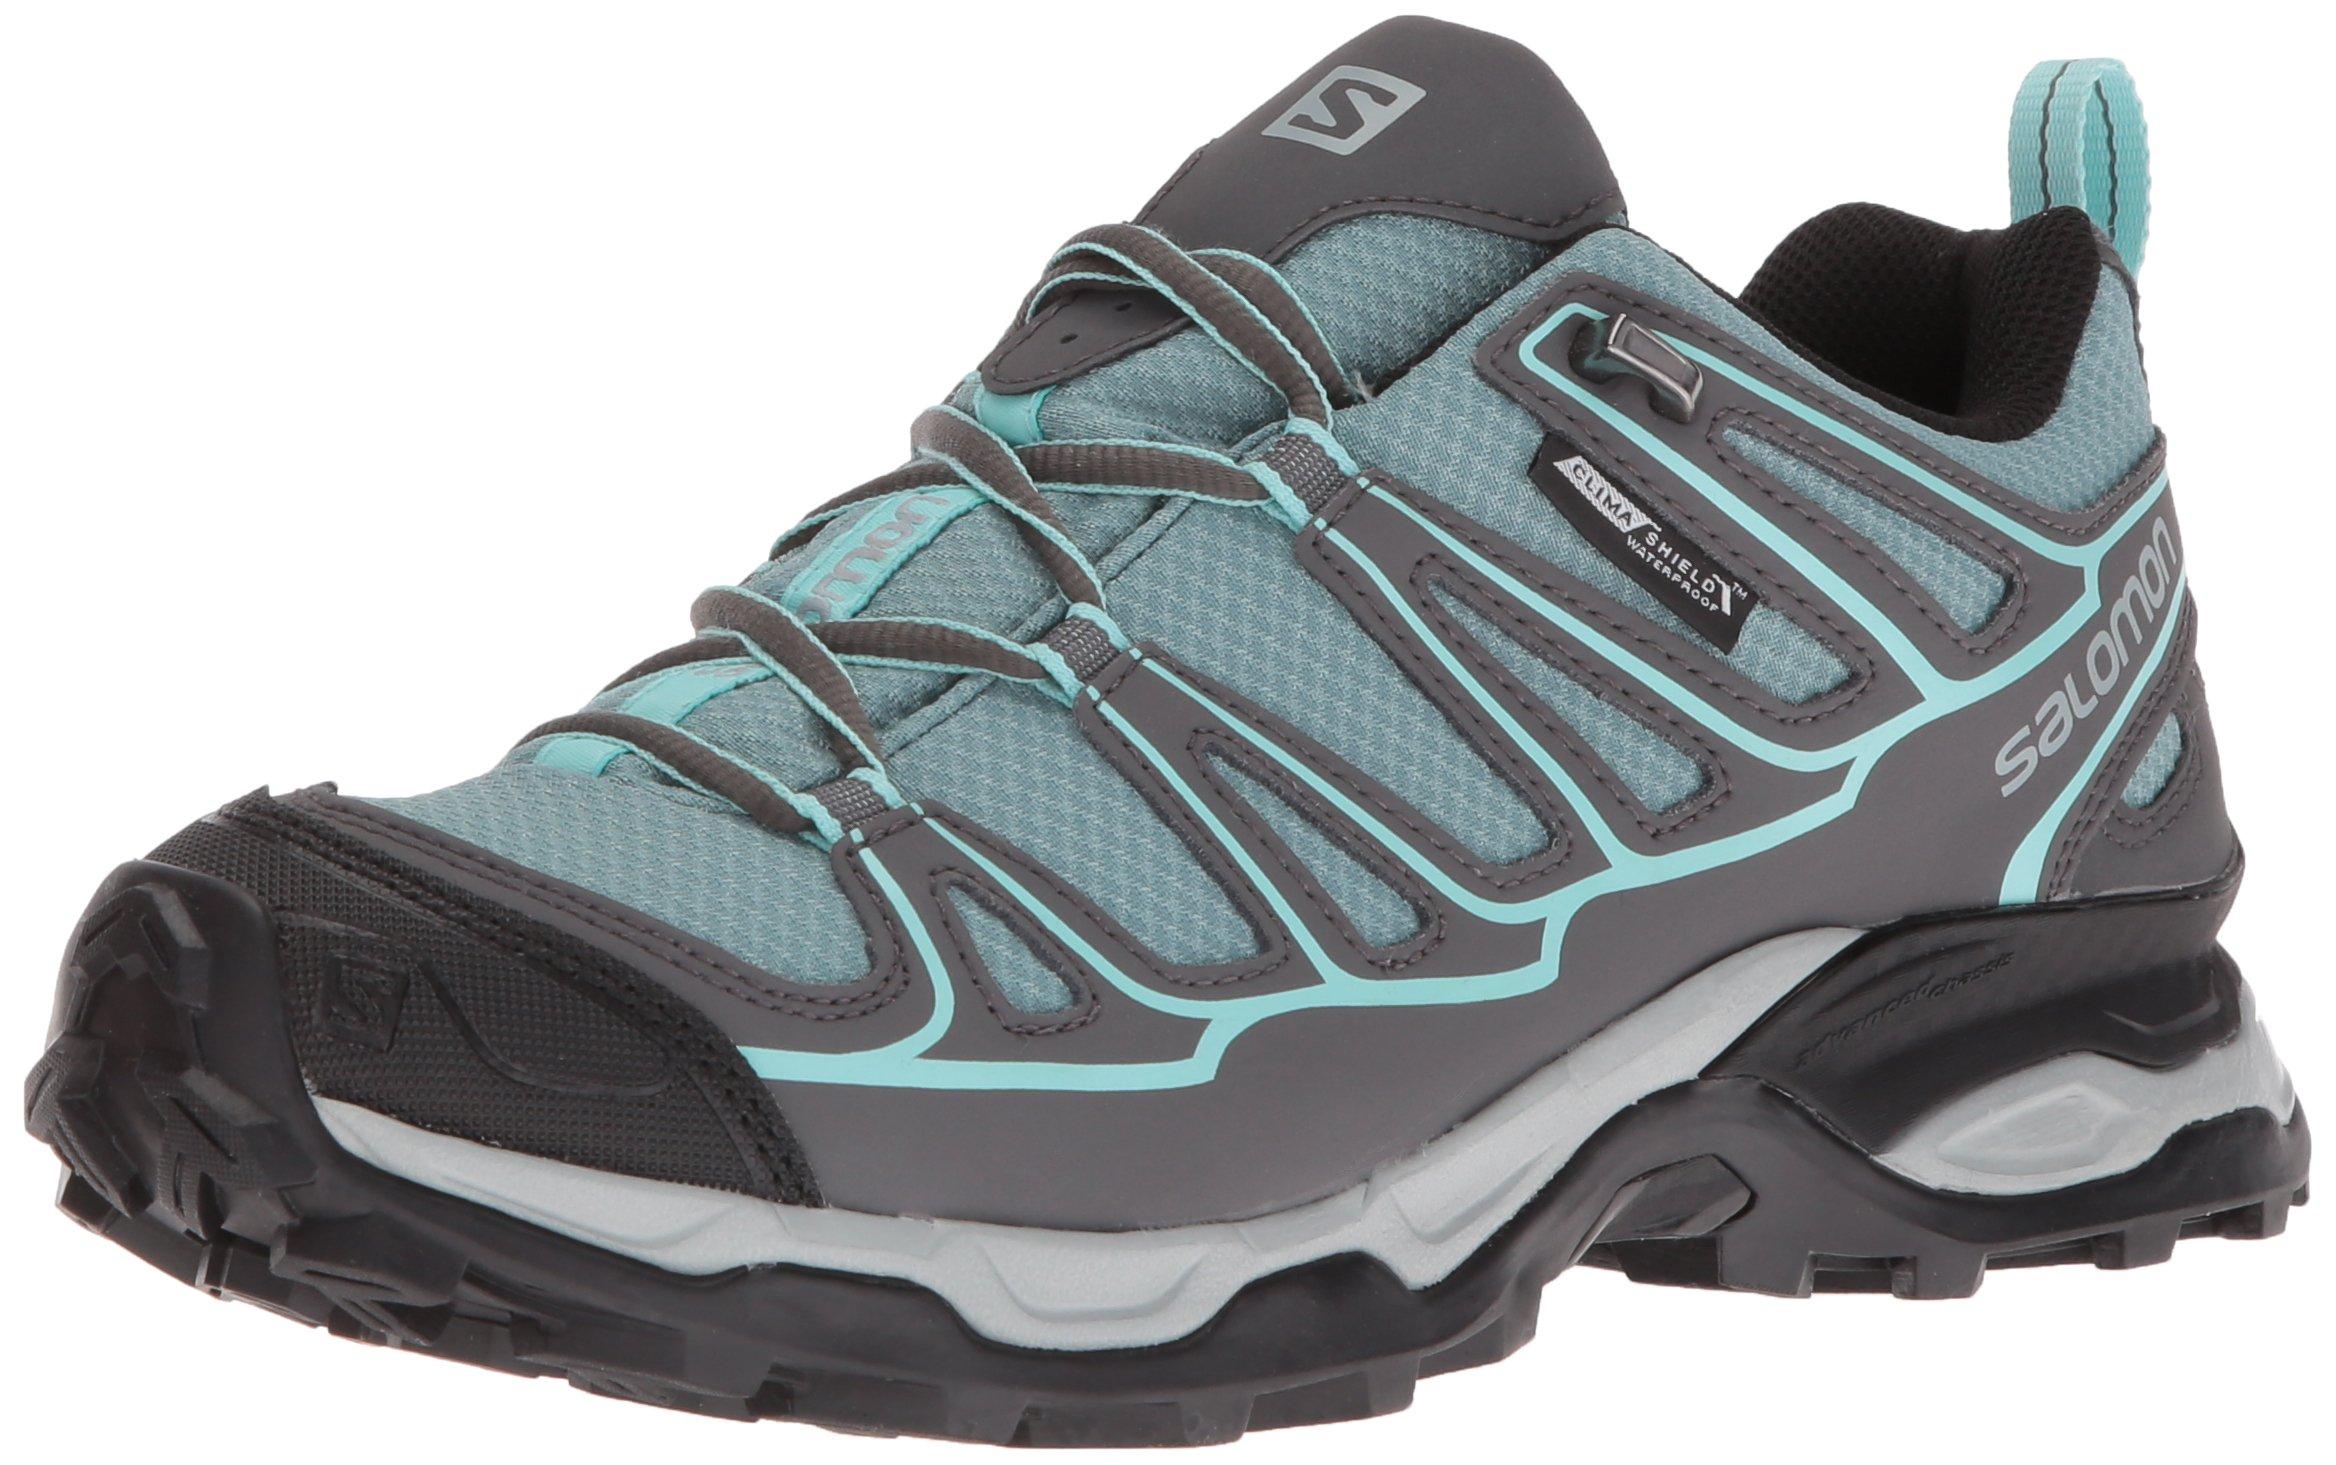 Salomon Women's X Ultra Prime CS Waterproof W Hiking-Shoes, Artic, 9 M US